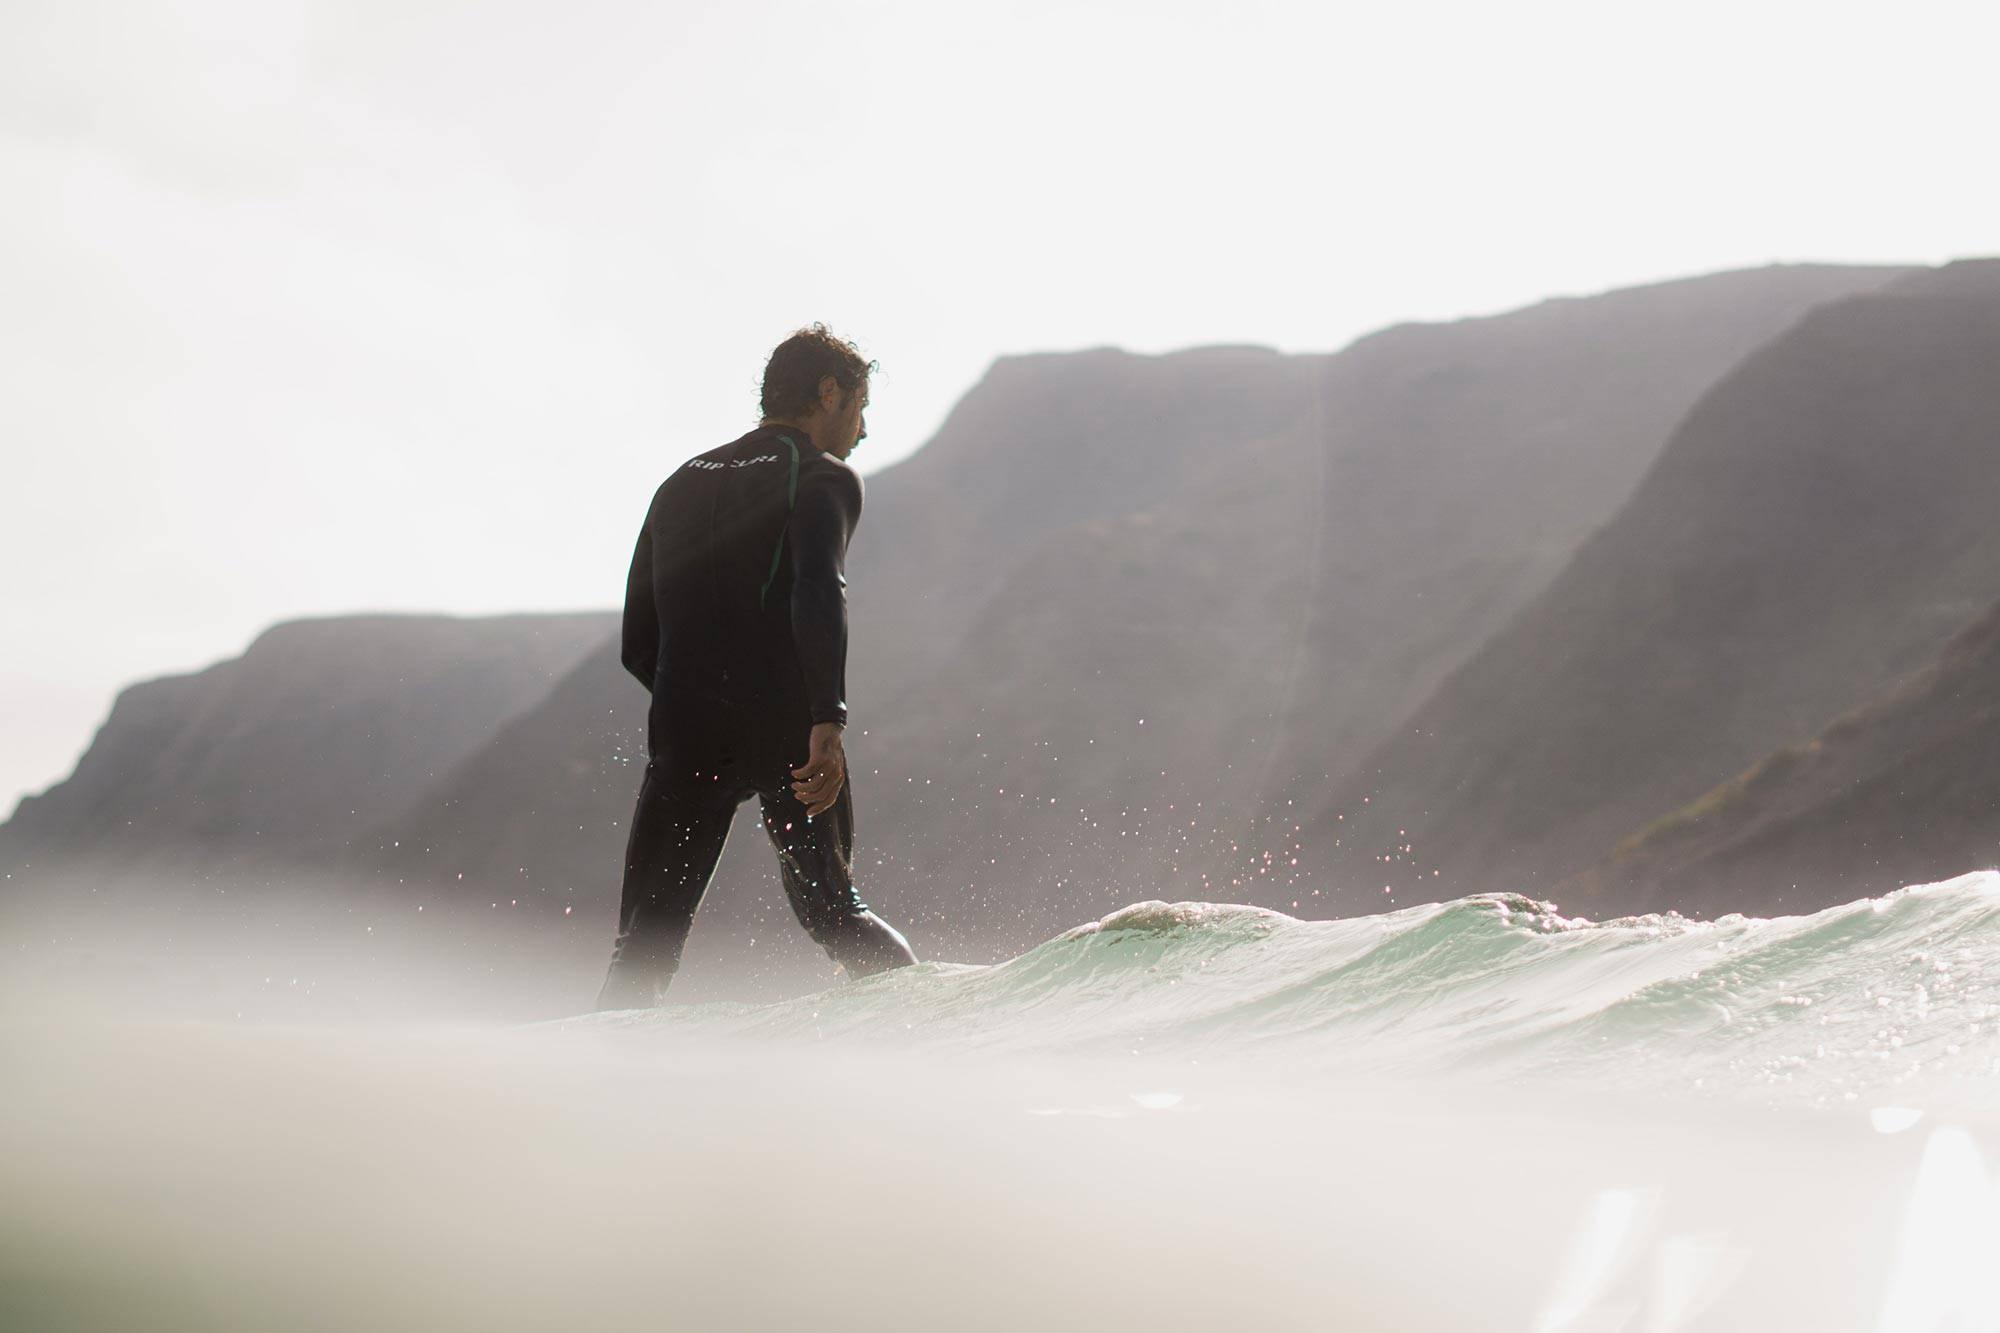 https://www.soulandsurf.com/wp-content/uploads/2021/07/@joeliooo_Surf_Guests_.jpg